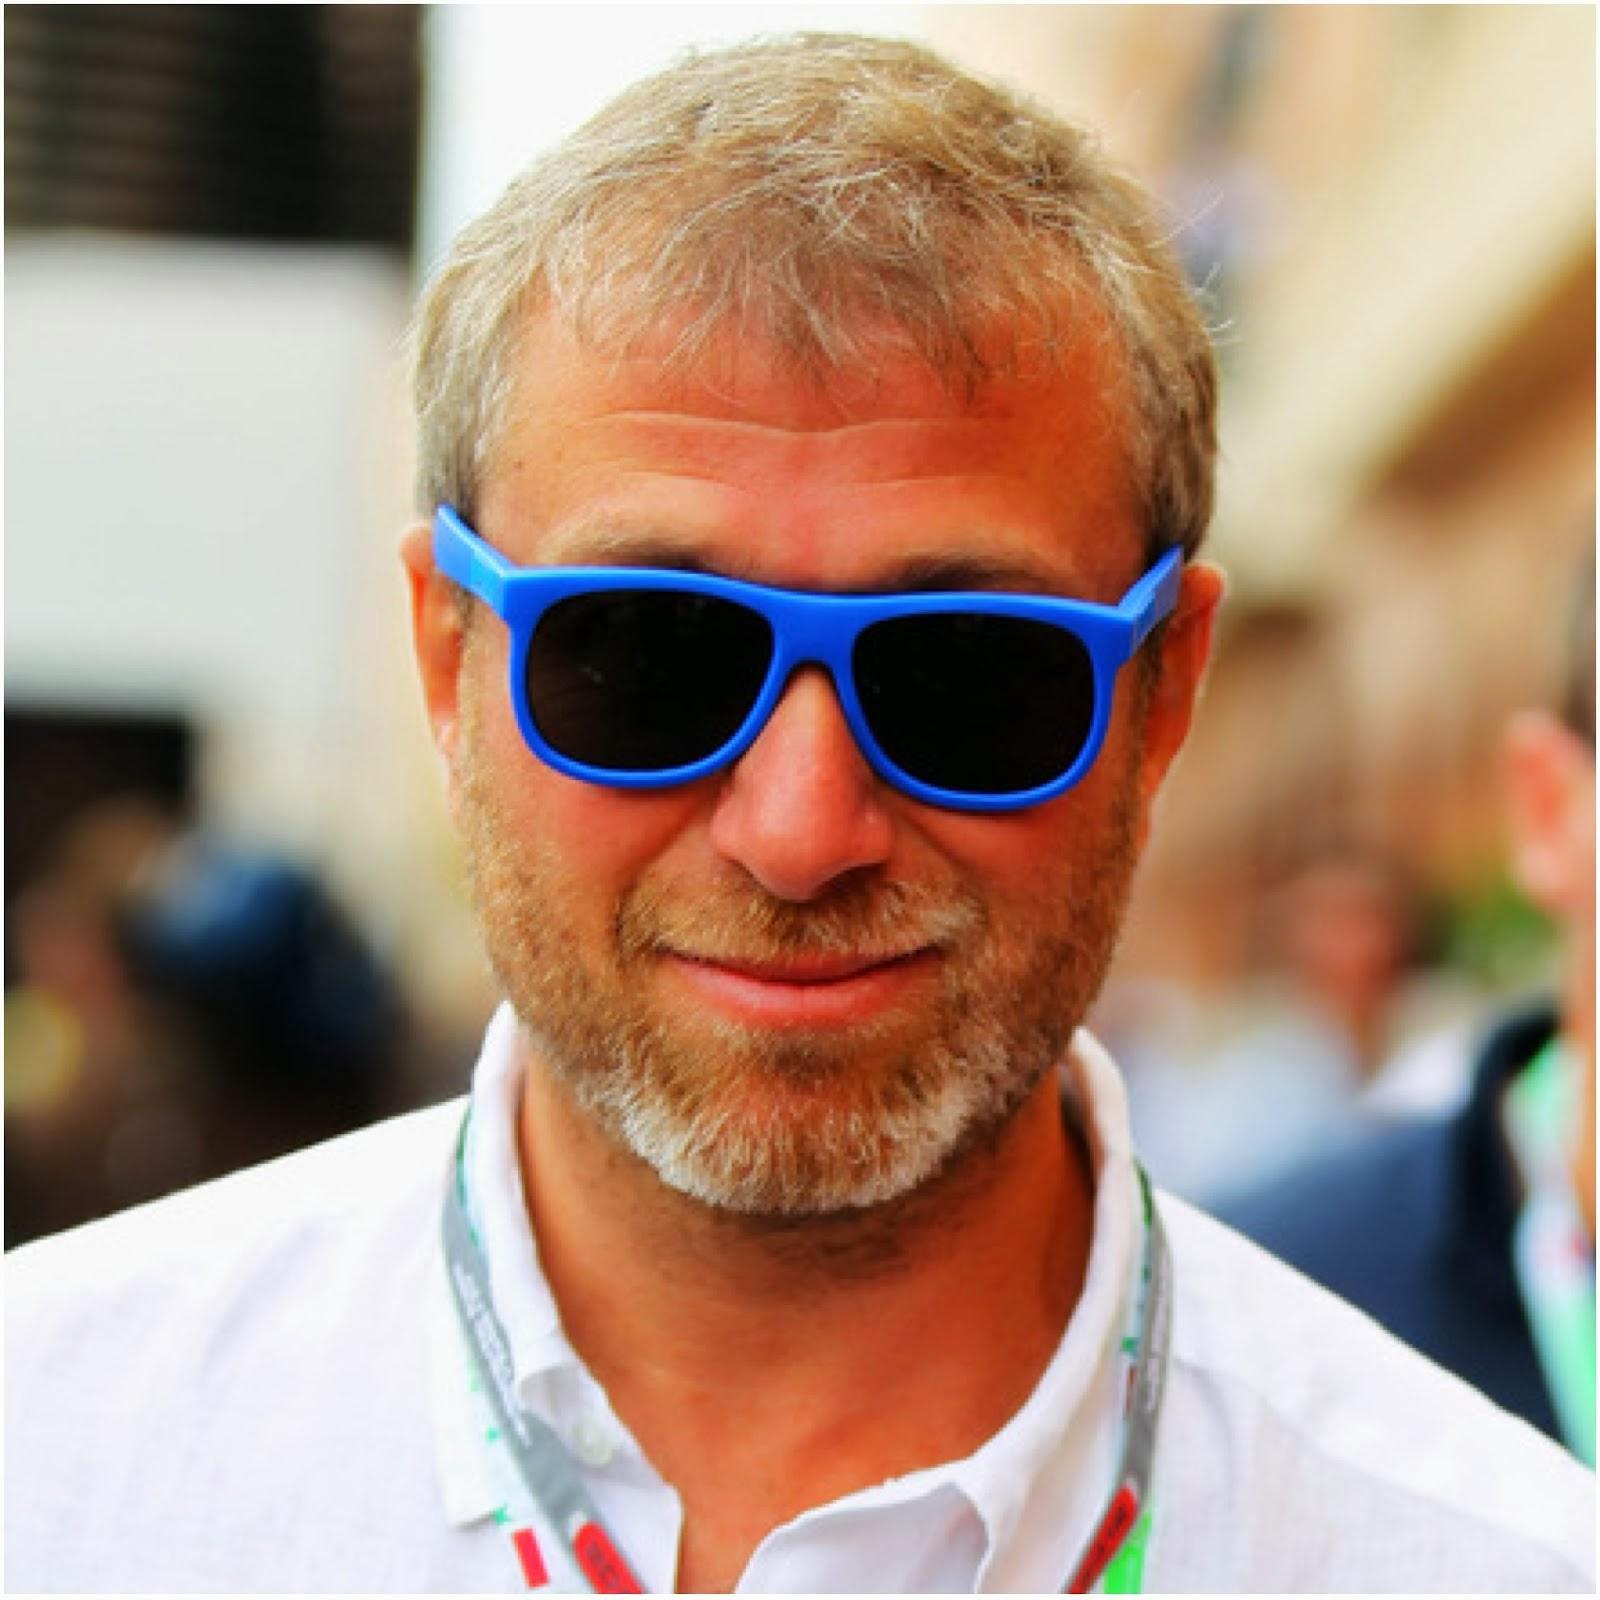 Roman Abramovich's blue Vilebrequin Sunglasses - St Bart's Street Style